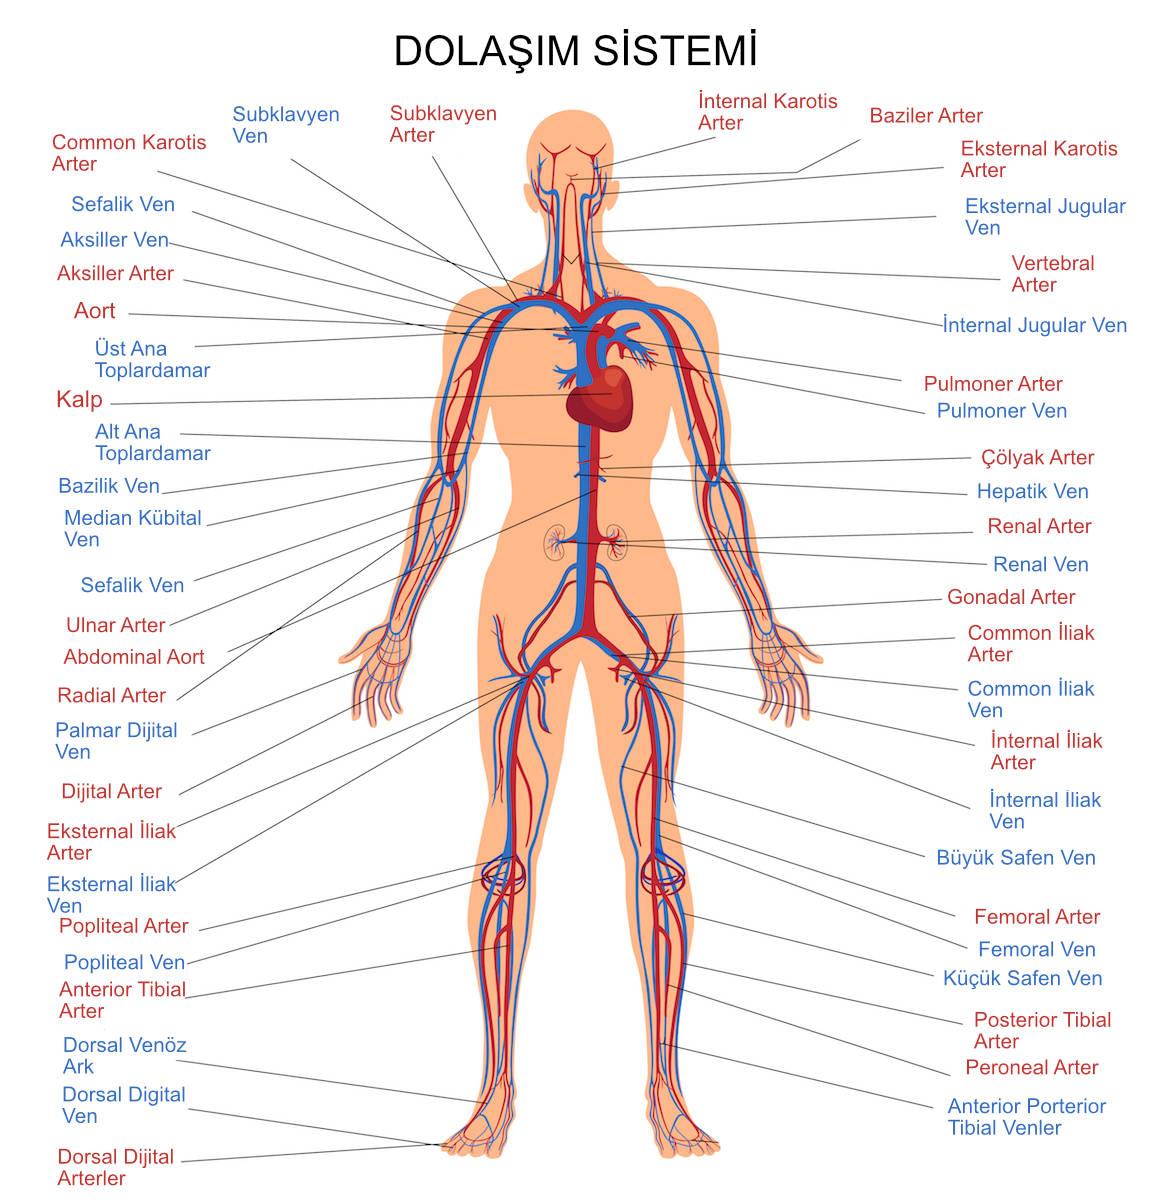 dolasim-sistemi